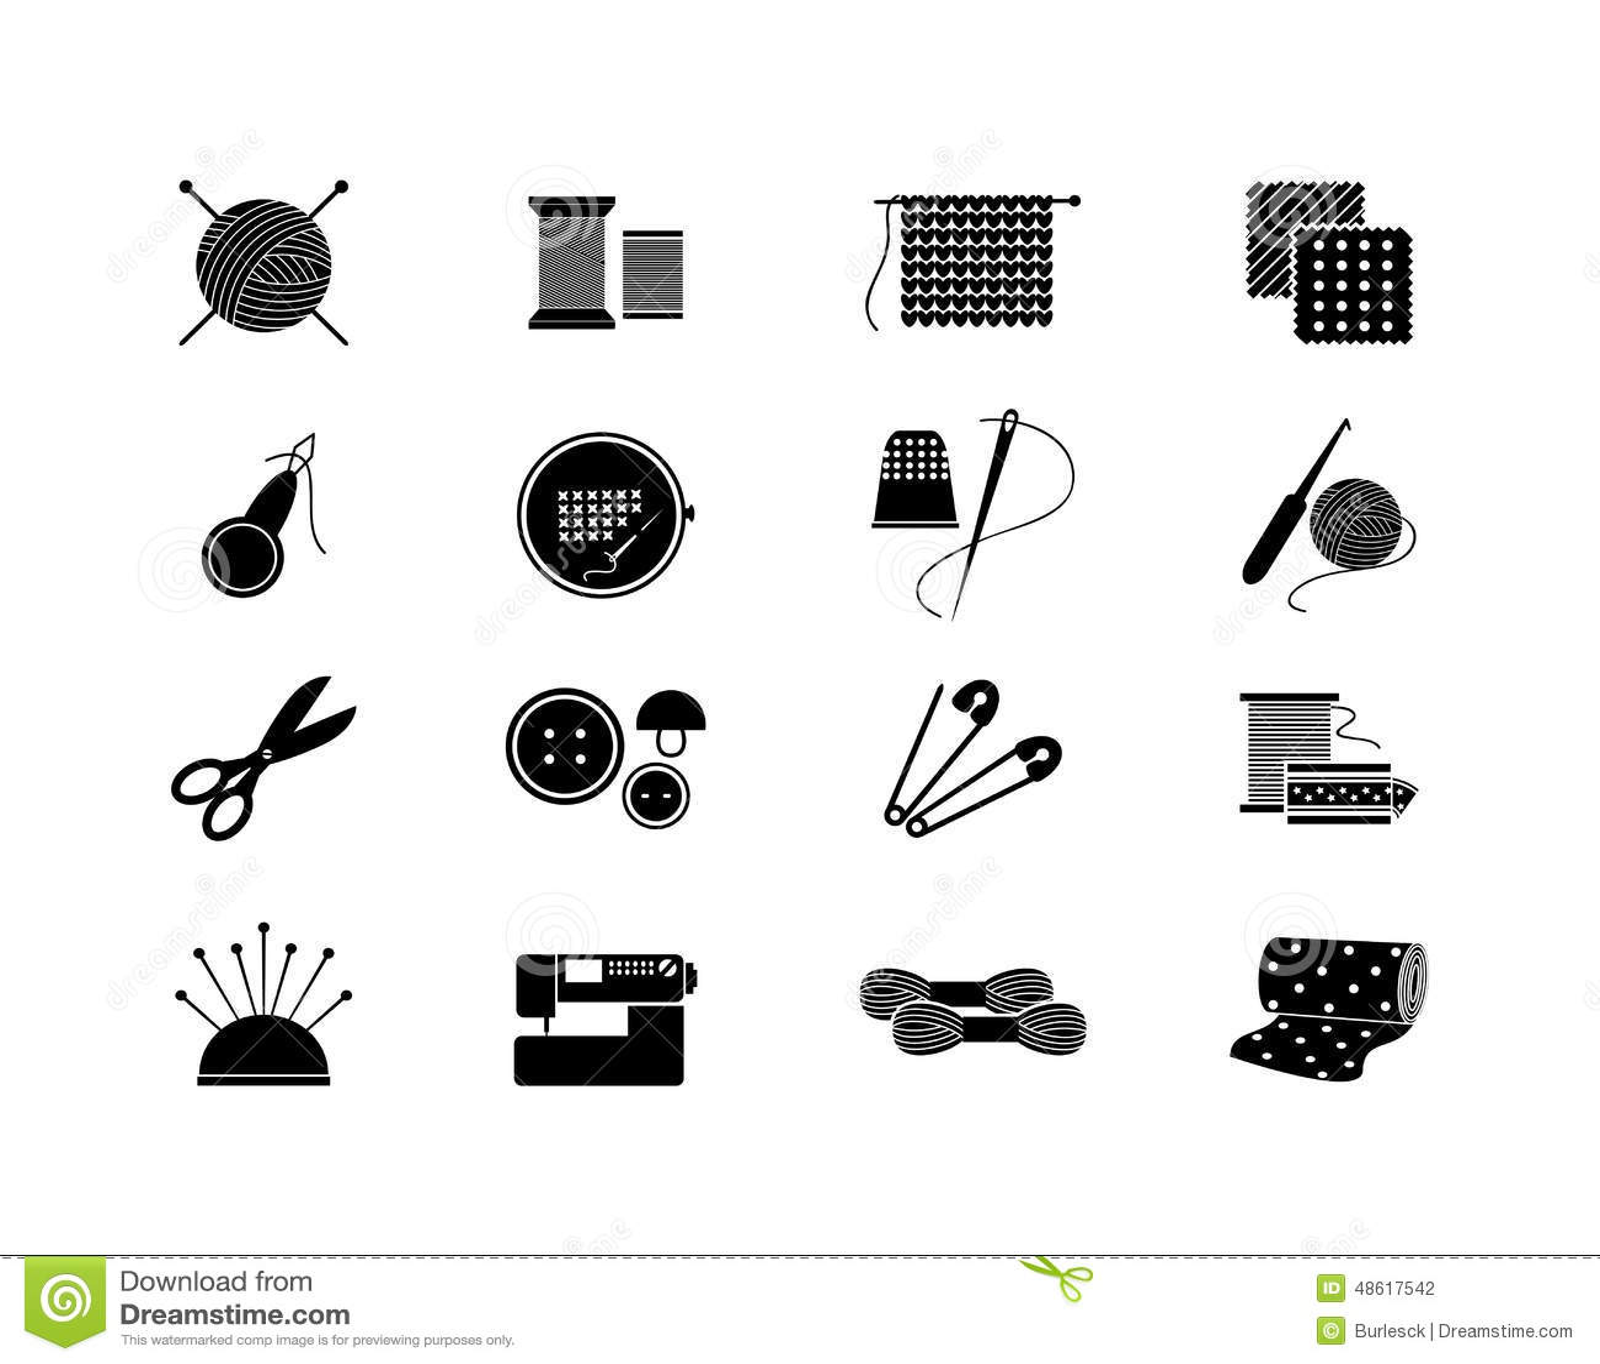 Needlework Icons For Sewing Knitting Needlework Stock